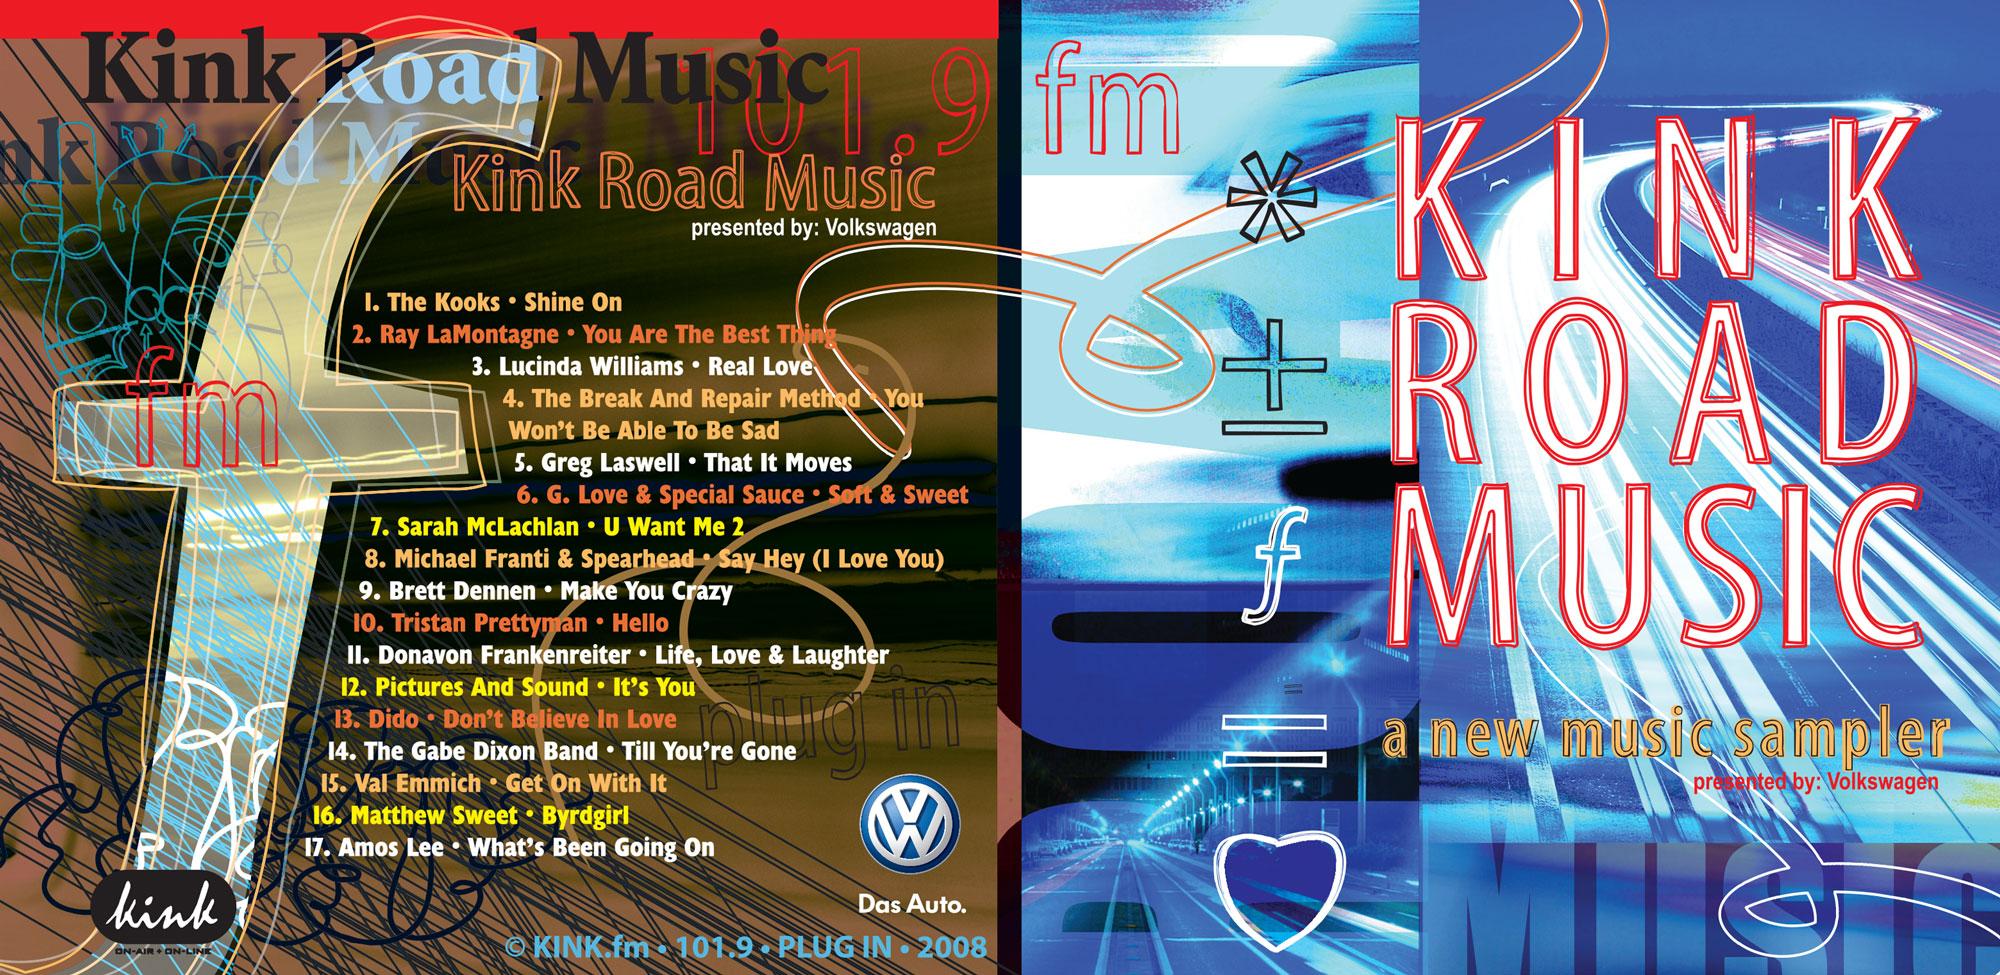 kink.fm road music sponsored by VW